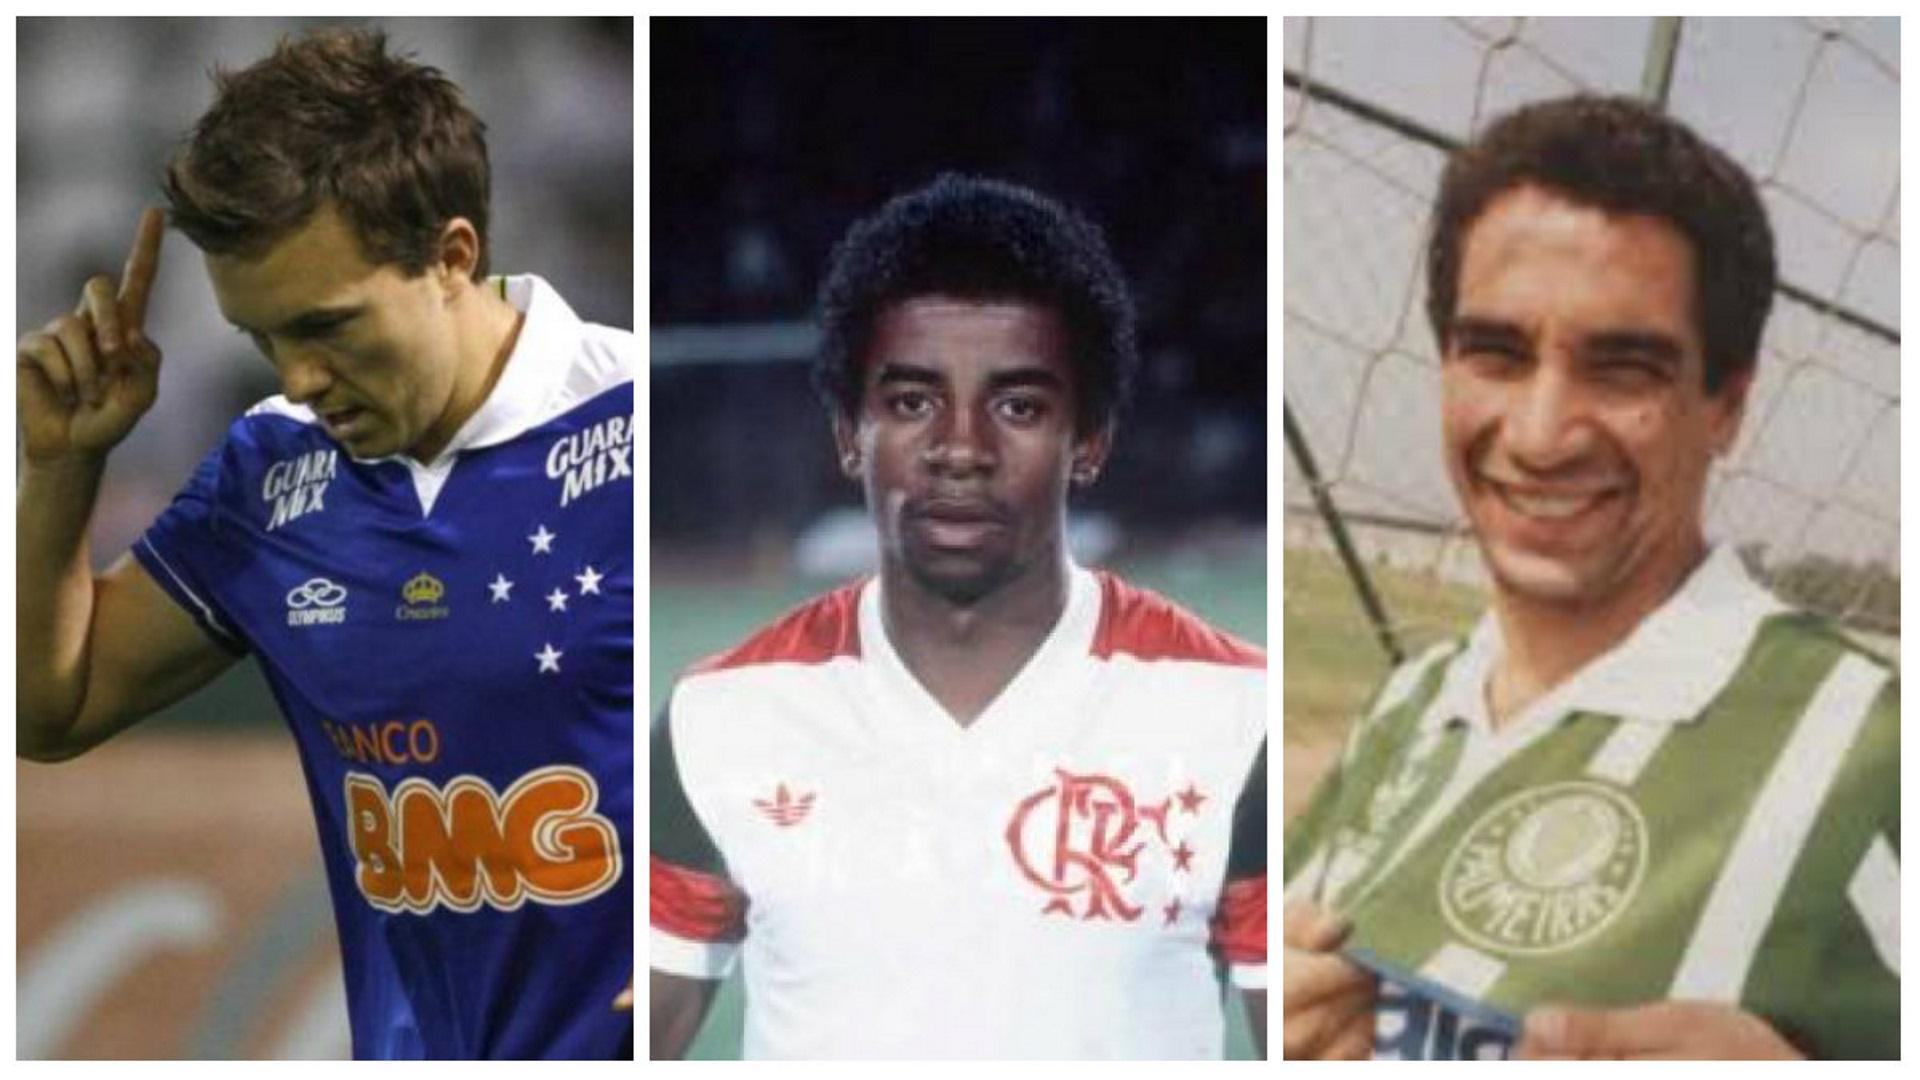 GFX Dagoberto, Andrade, Zinho